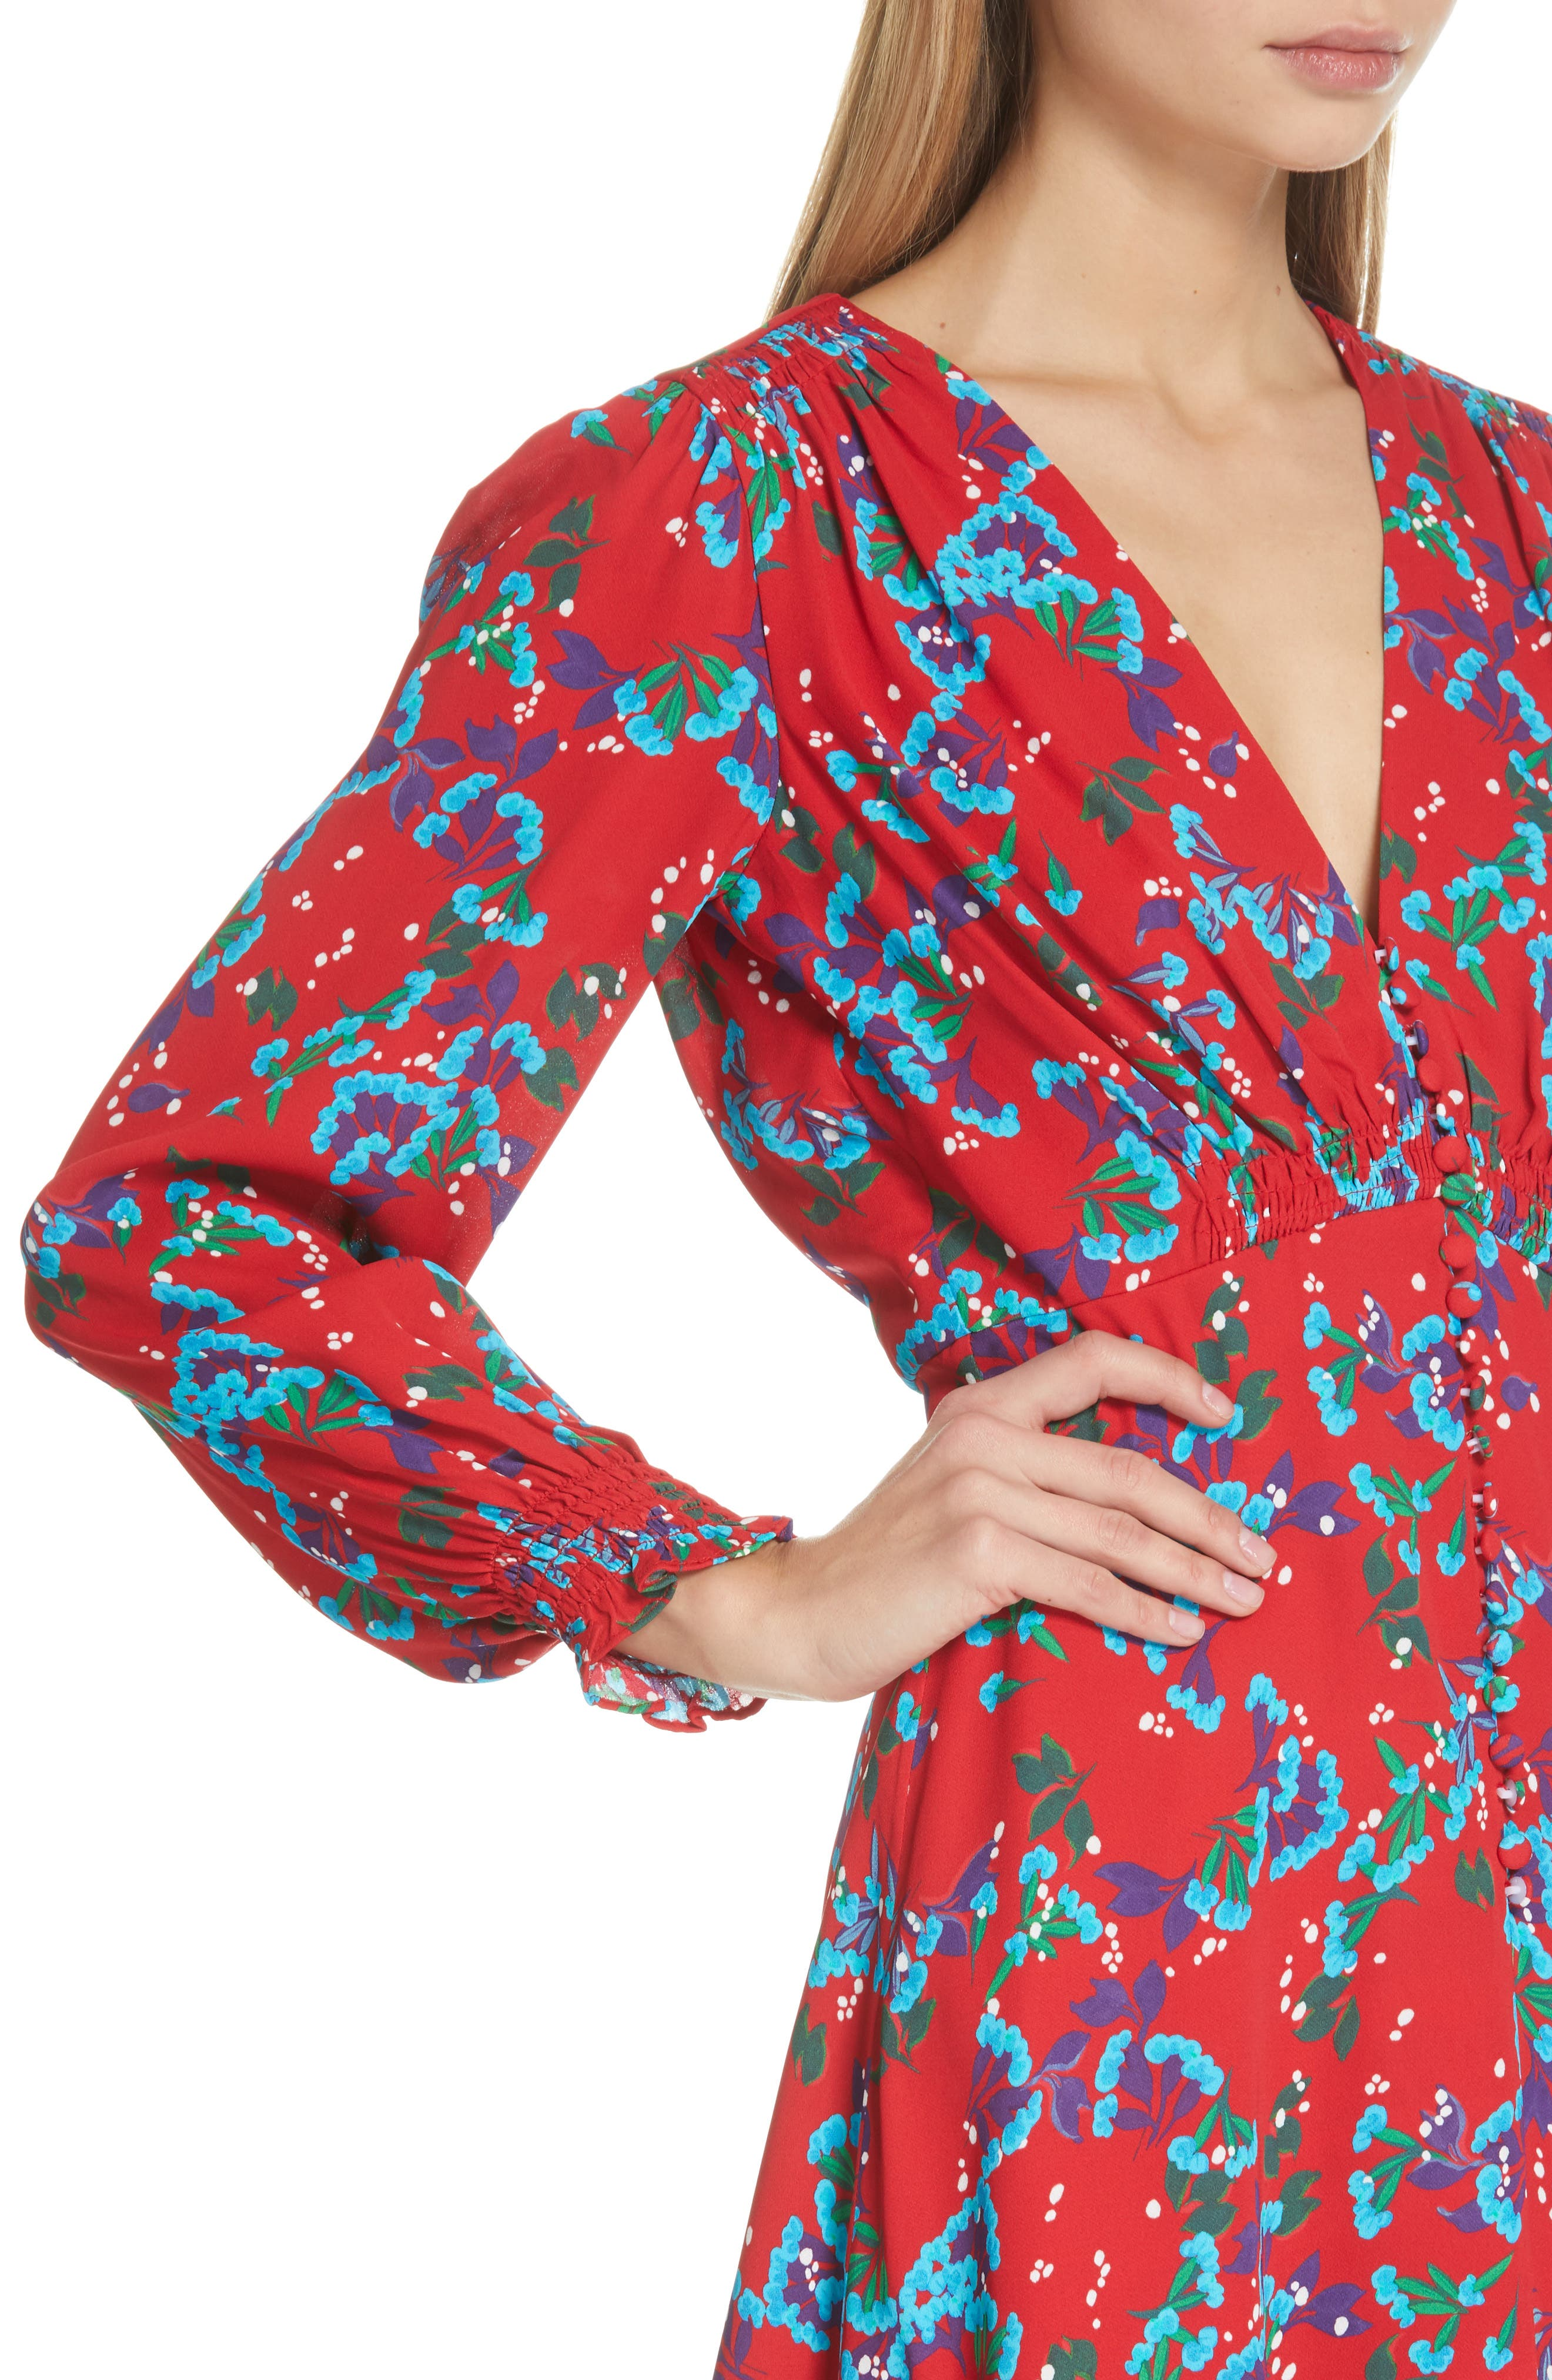 Eve Floral Print Dress,                             Alternate thumbnail 4, color,                             SCARLET SWEETPEAS